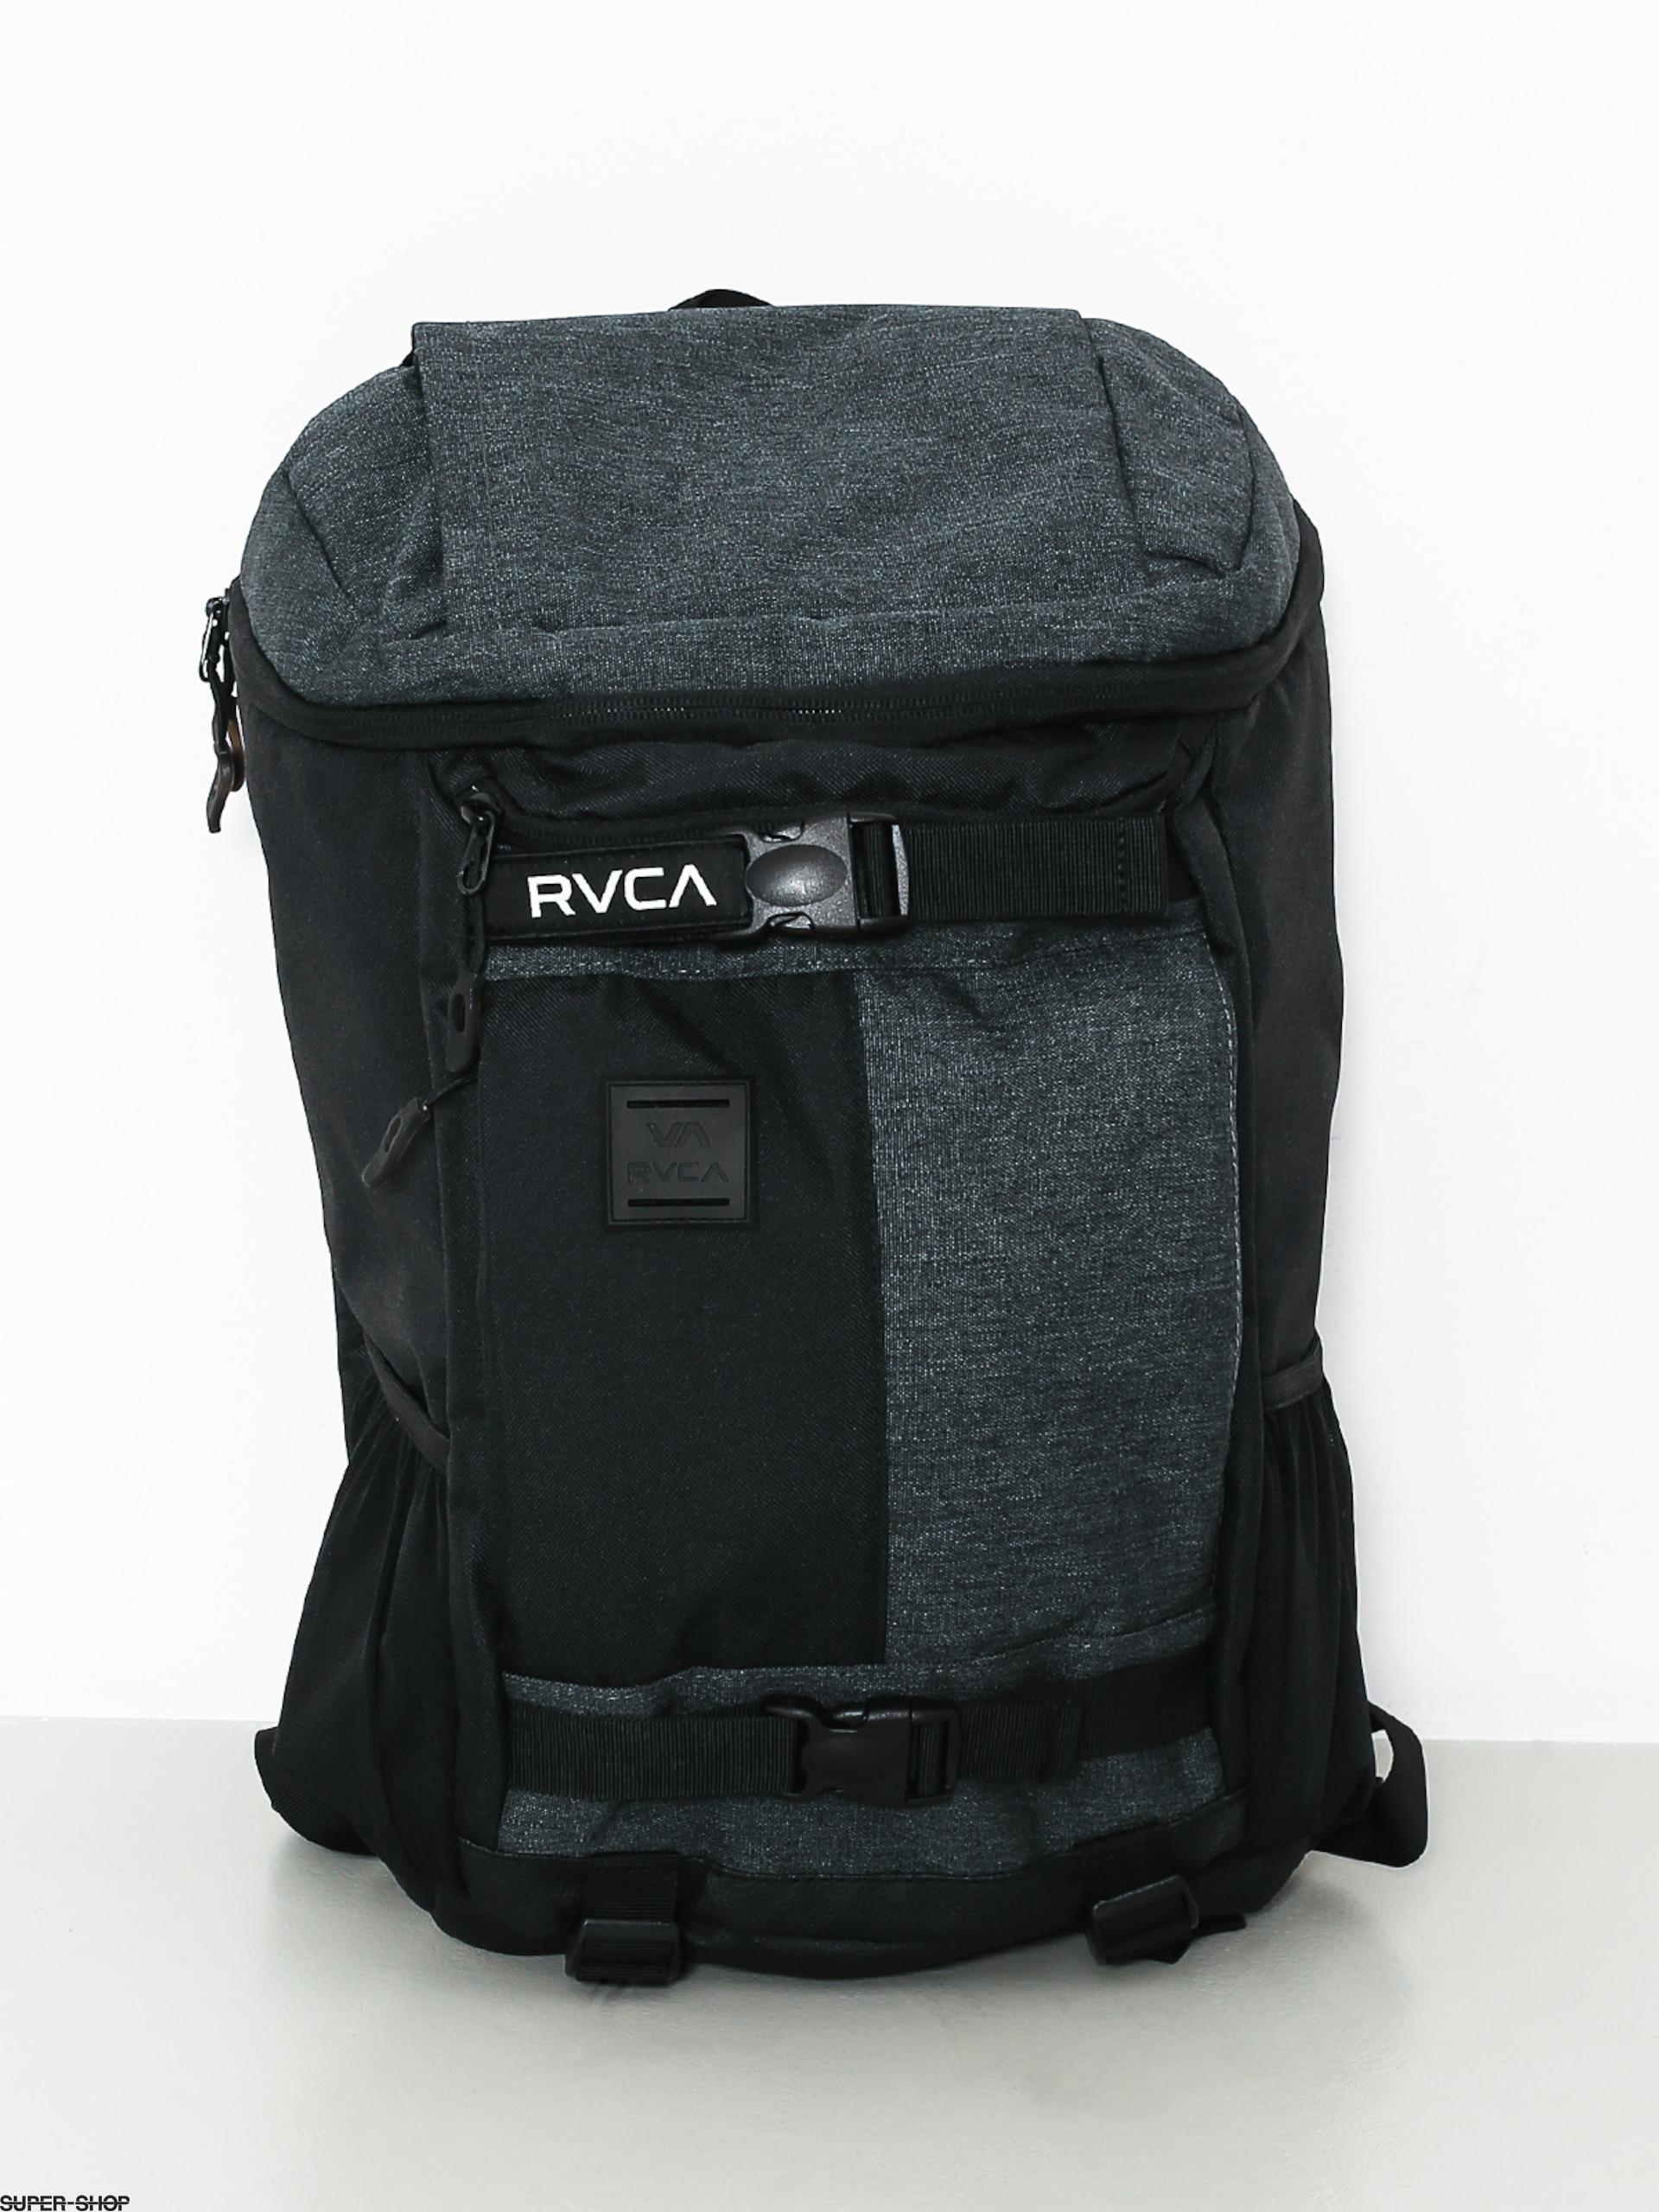 1008741-w1920-rvca-voyage-skate-backpack-charcoal-heather.jpg 47db10f019a71